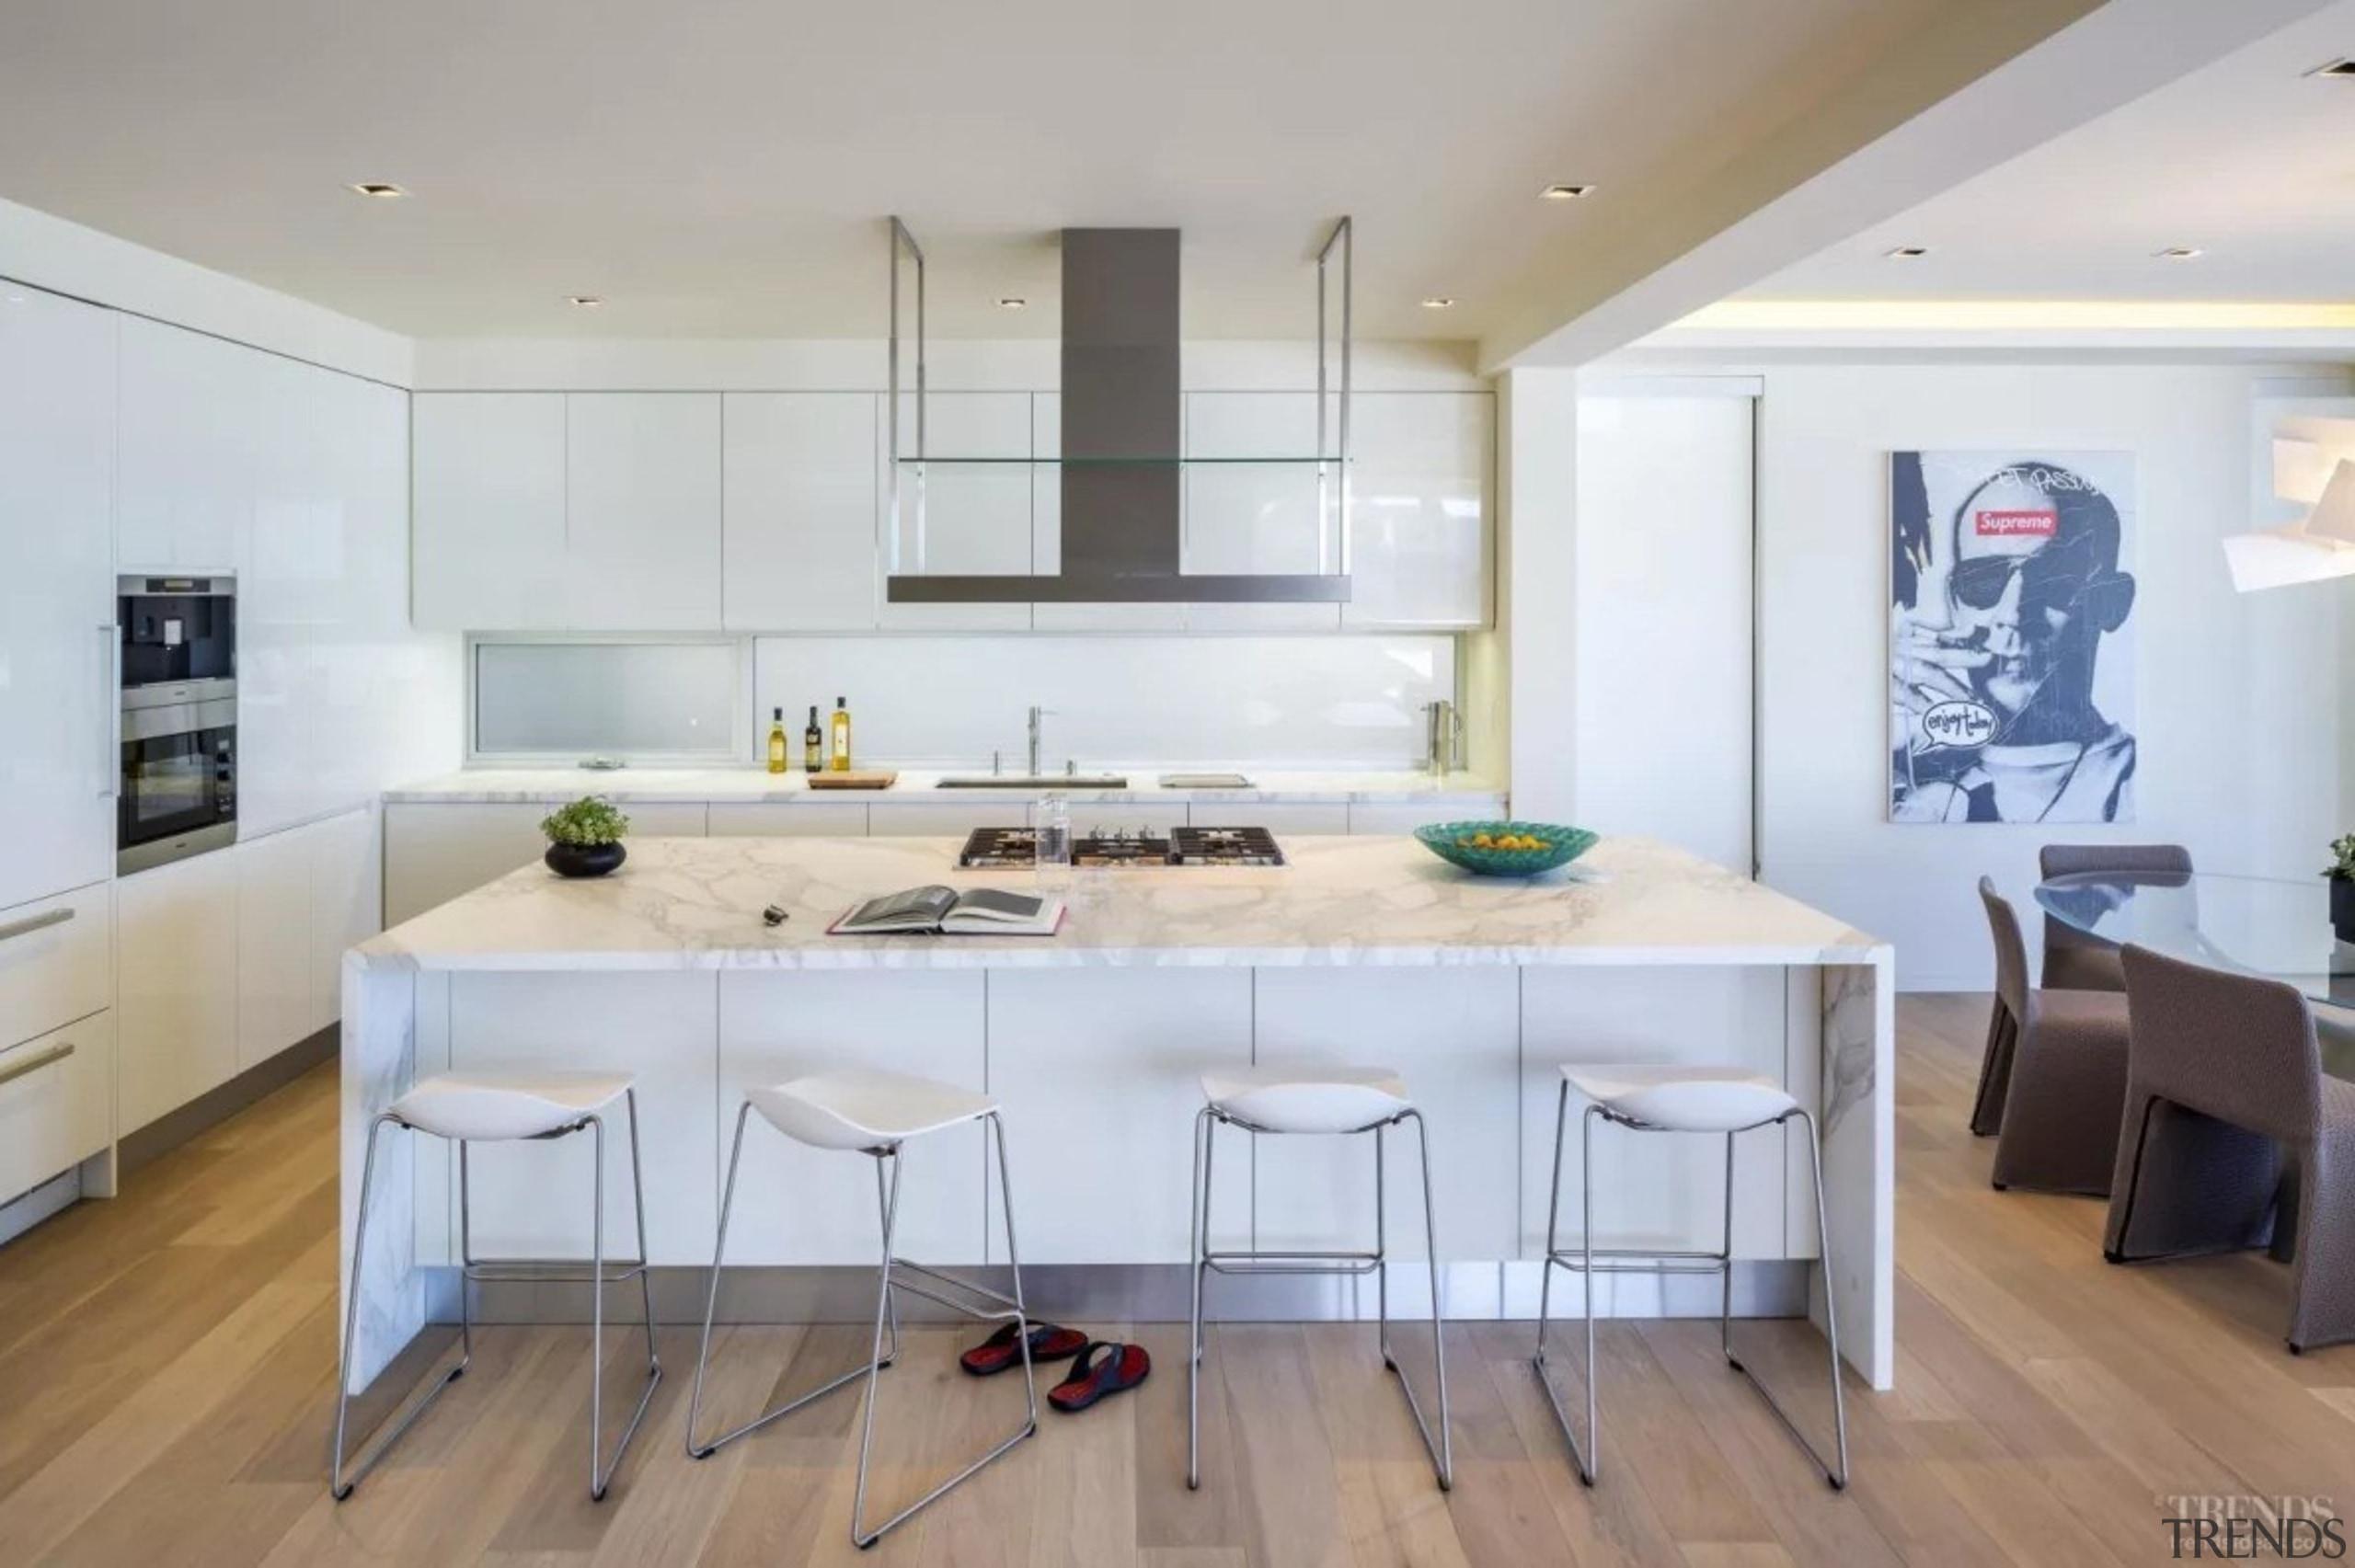 6Cb1B Screen Shot 2017 07 25 At 121657 cabinetry, countertop, cuisine classique, floor, flooring, interior design, kitchen, real estate, room, wood flooring, white, gray